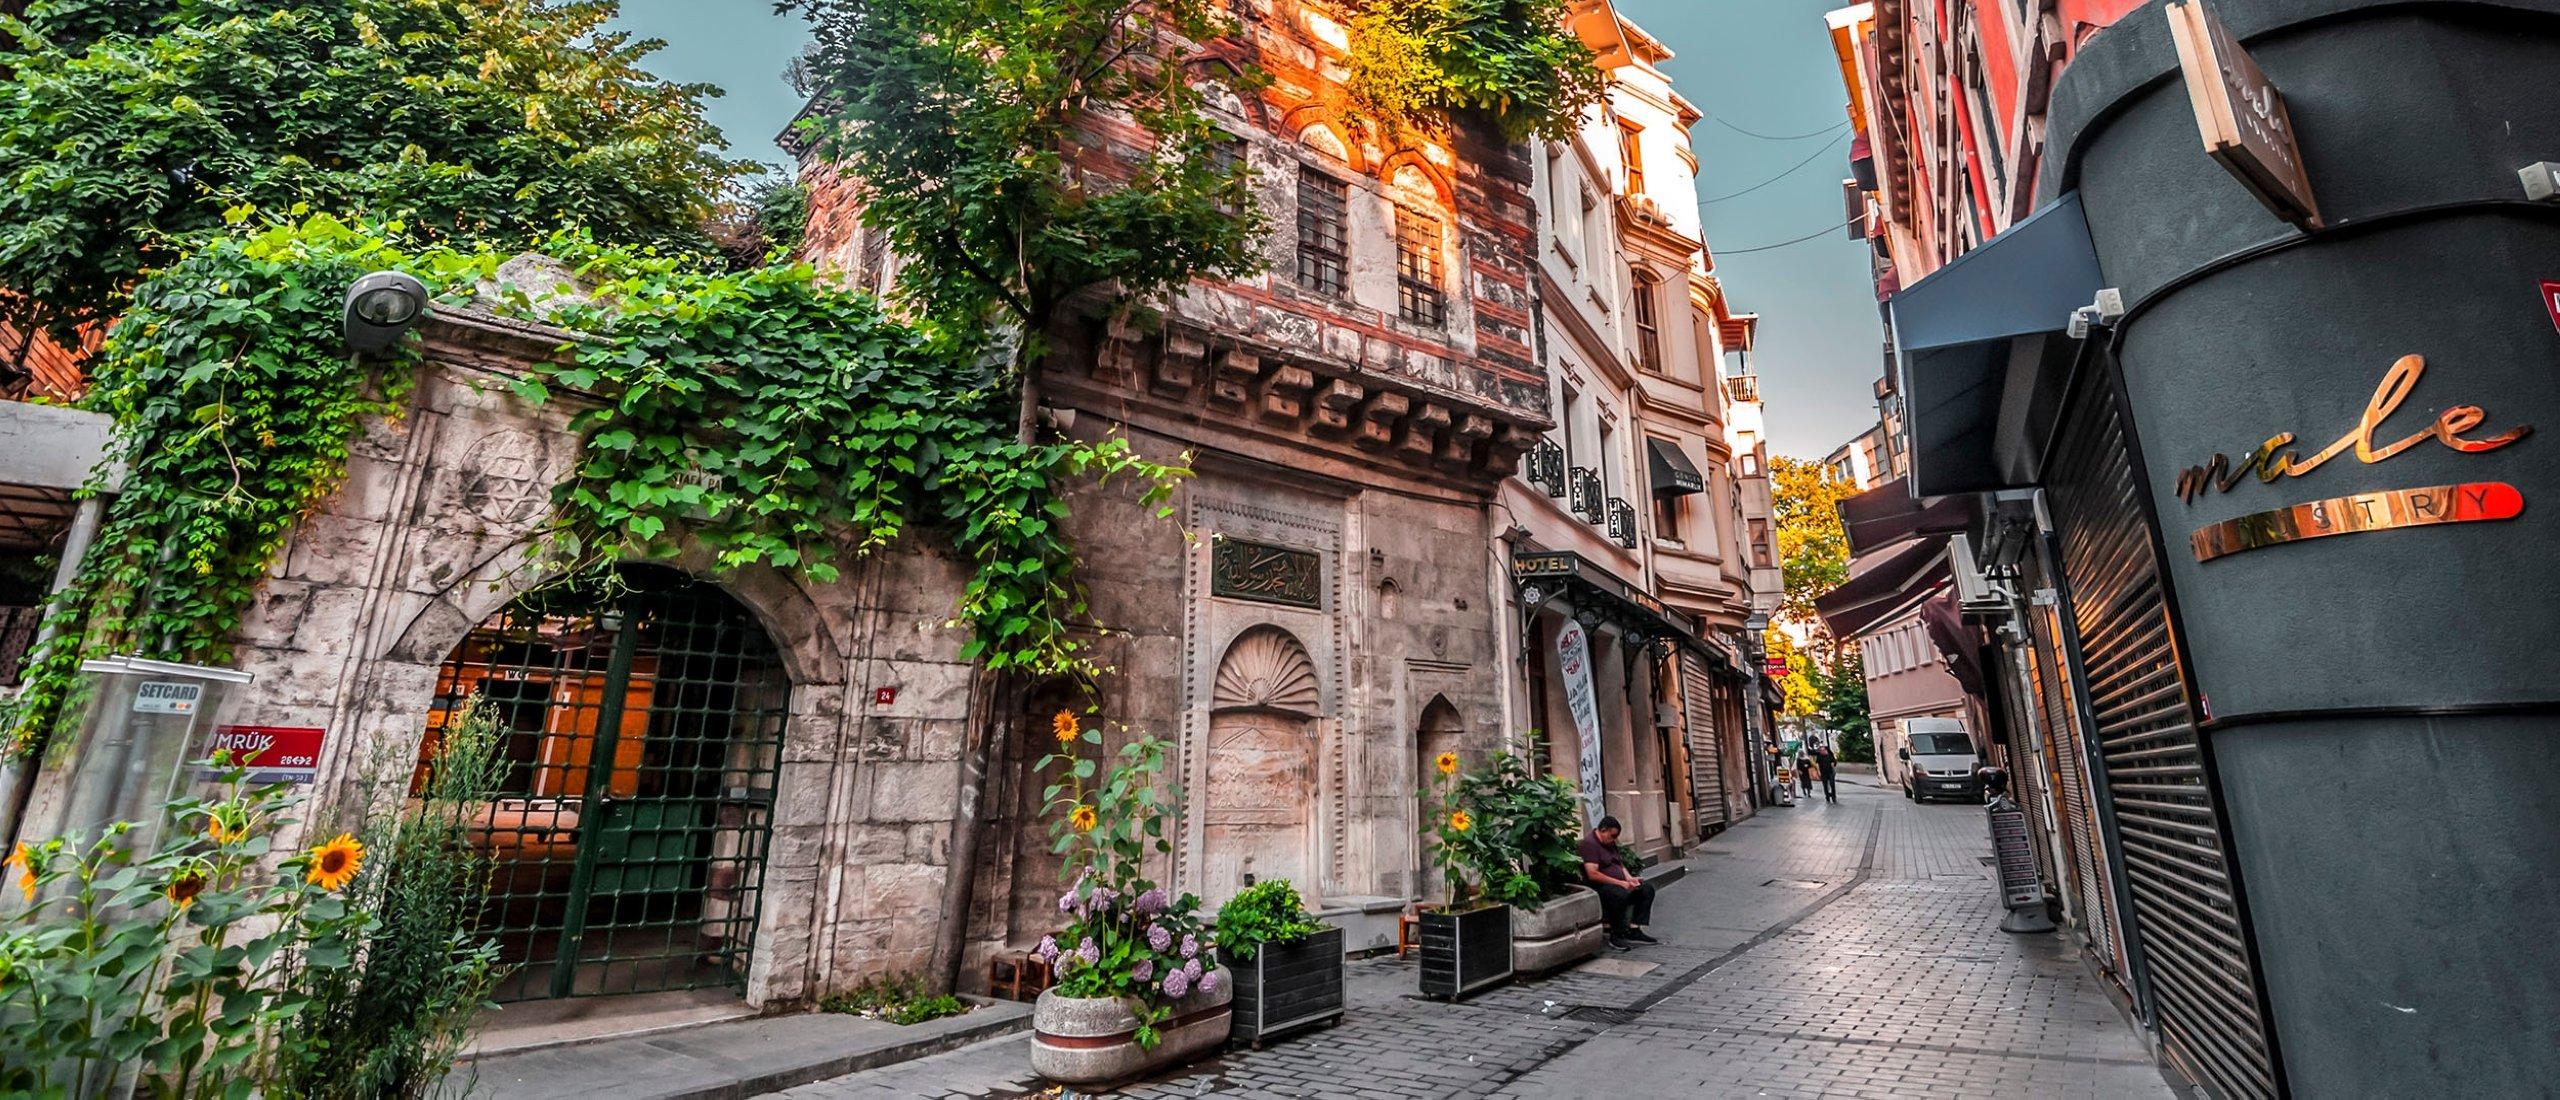 A street view of the Karaköy district of Beyoğlu, Istanbul, Turkey, June 27, 2019. (Shutterstock images)